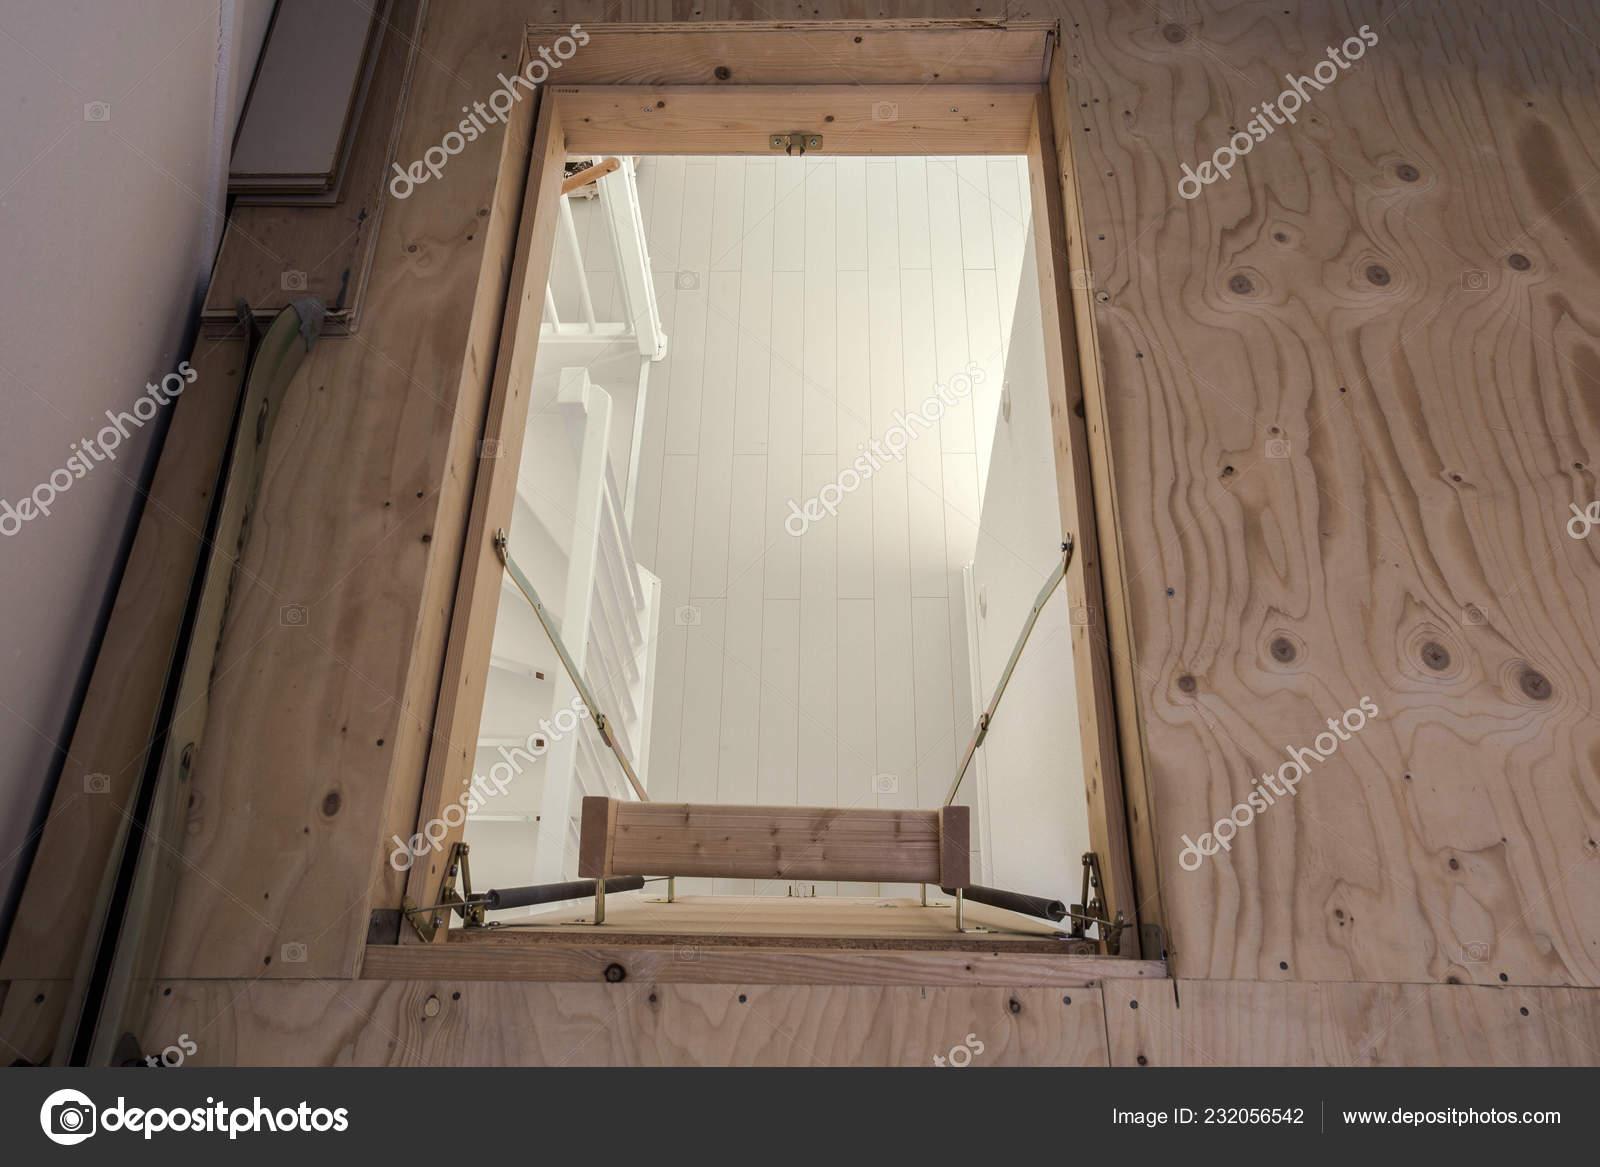 Scaletta In Legno Pieghevole : Scala in legno alla soffitta in una casa moderna vuota u foto